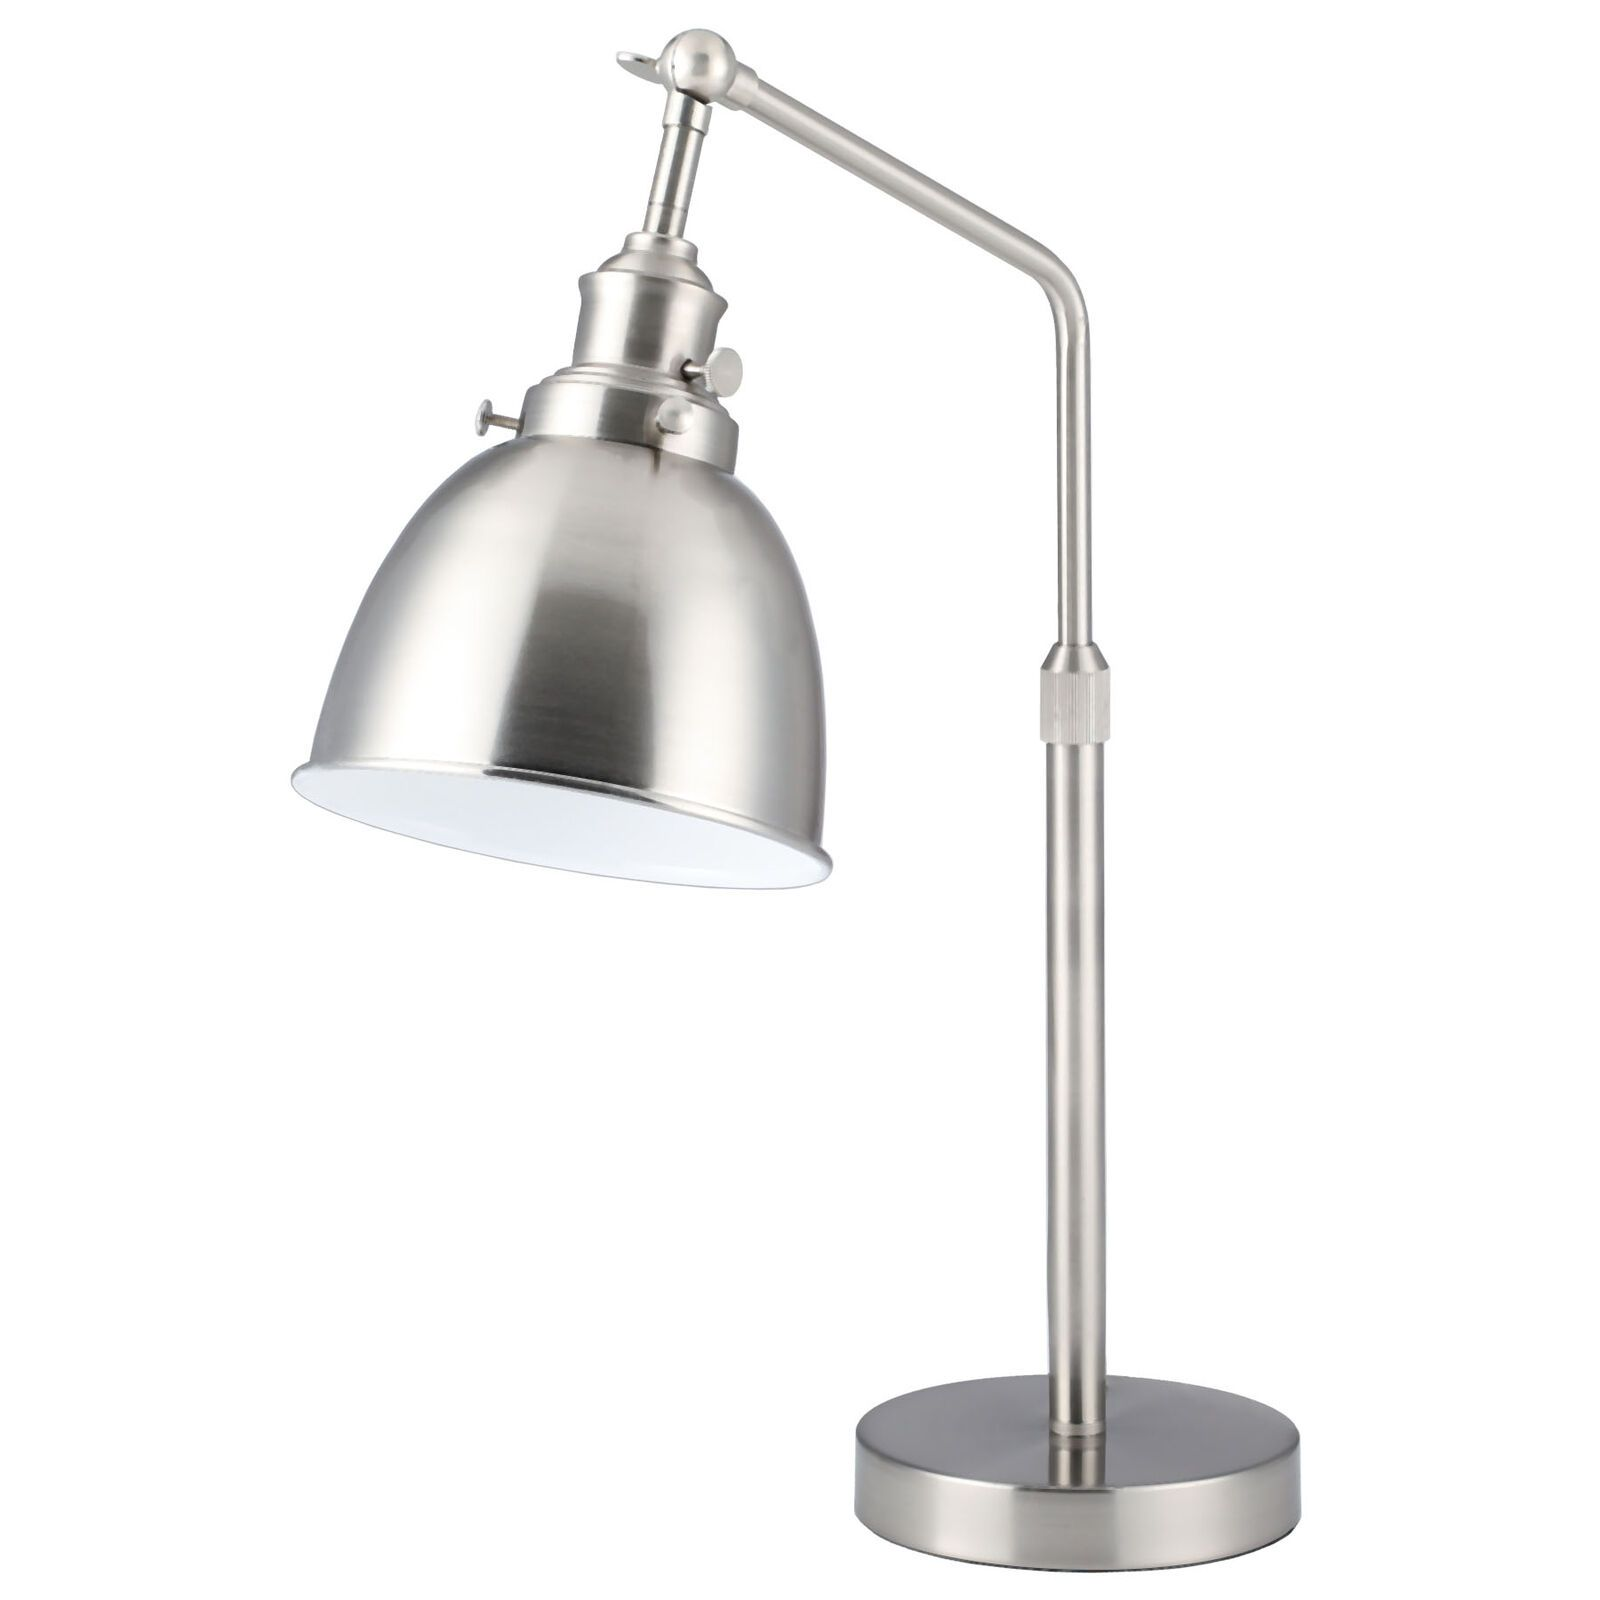 24 Silver Desk Lamp Industrial Modern Task Lamp Reading